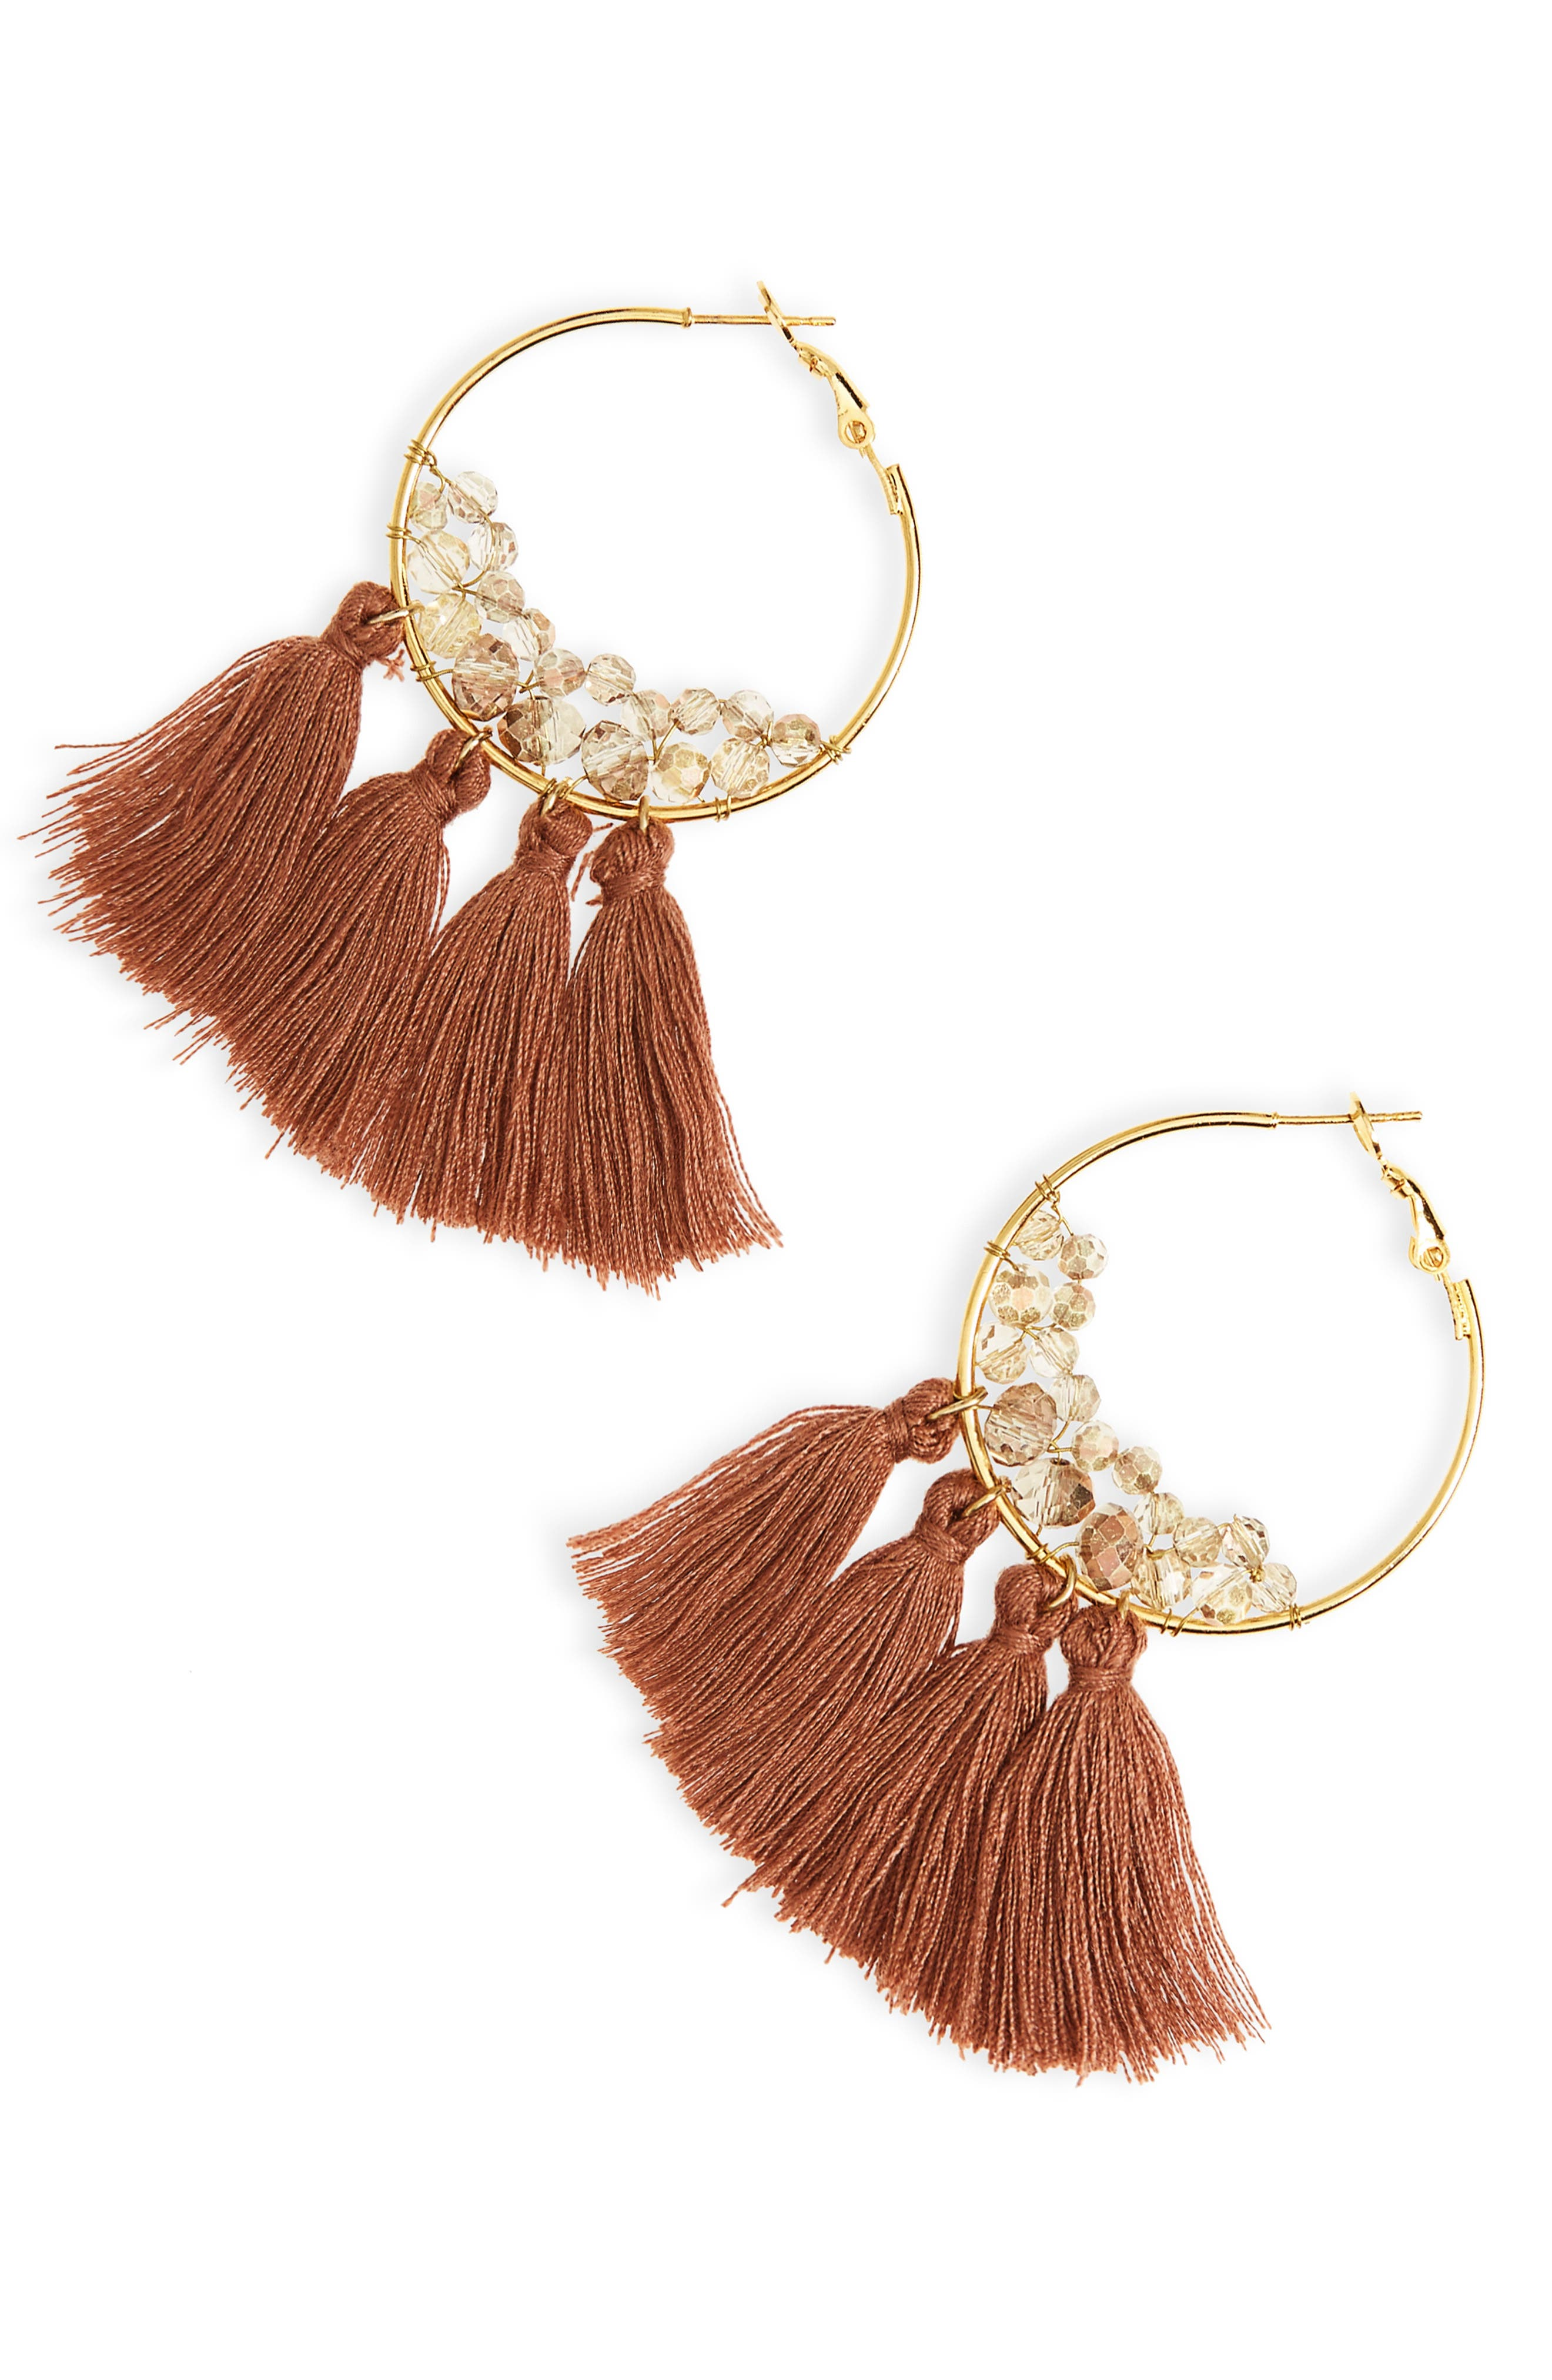 Tassel Hoop Earrings,                             Main thumbnail 1, color,                             200